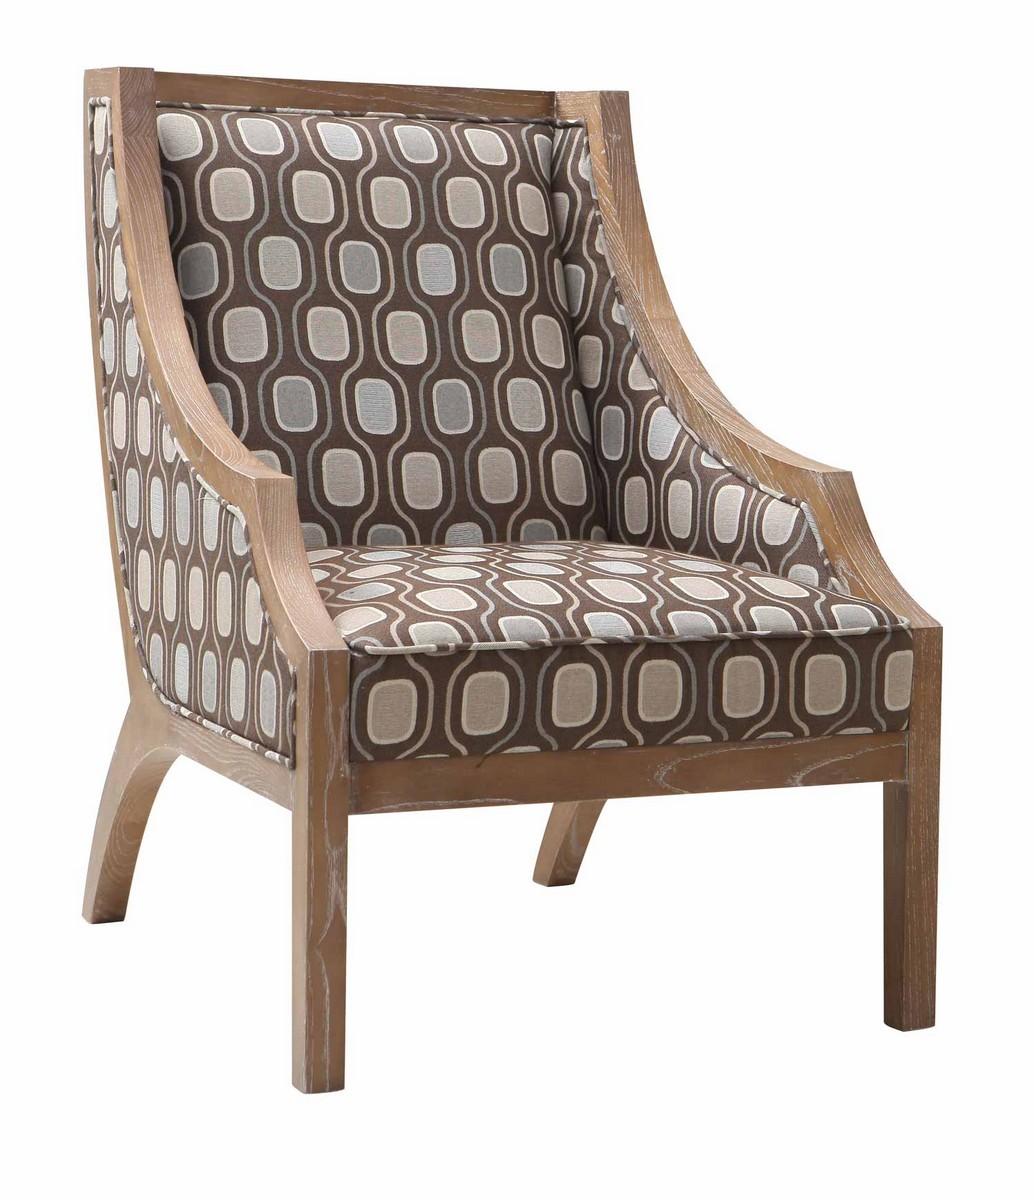 Armen Living Sahara Accent Chair - Multi Colored